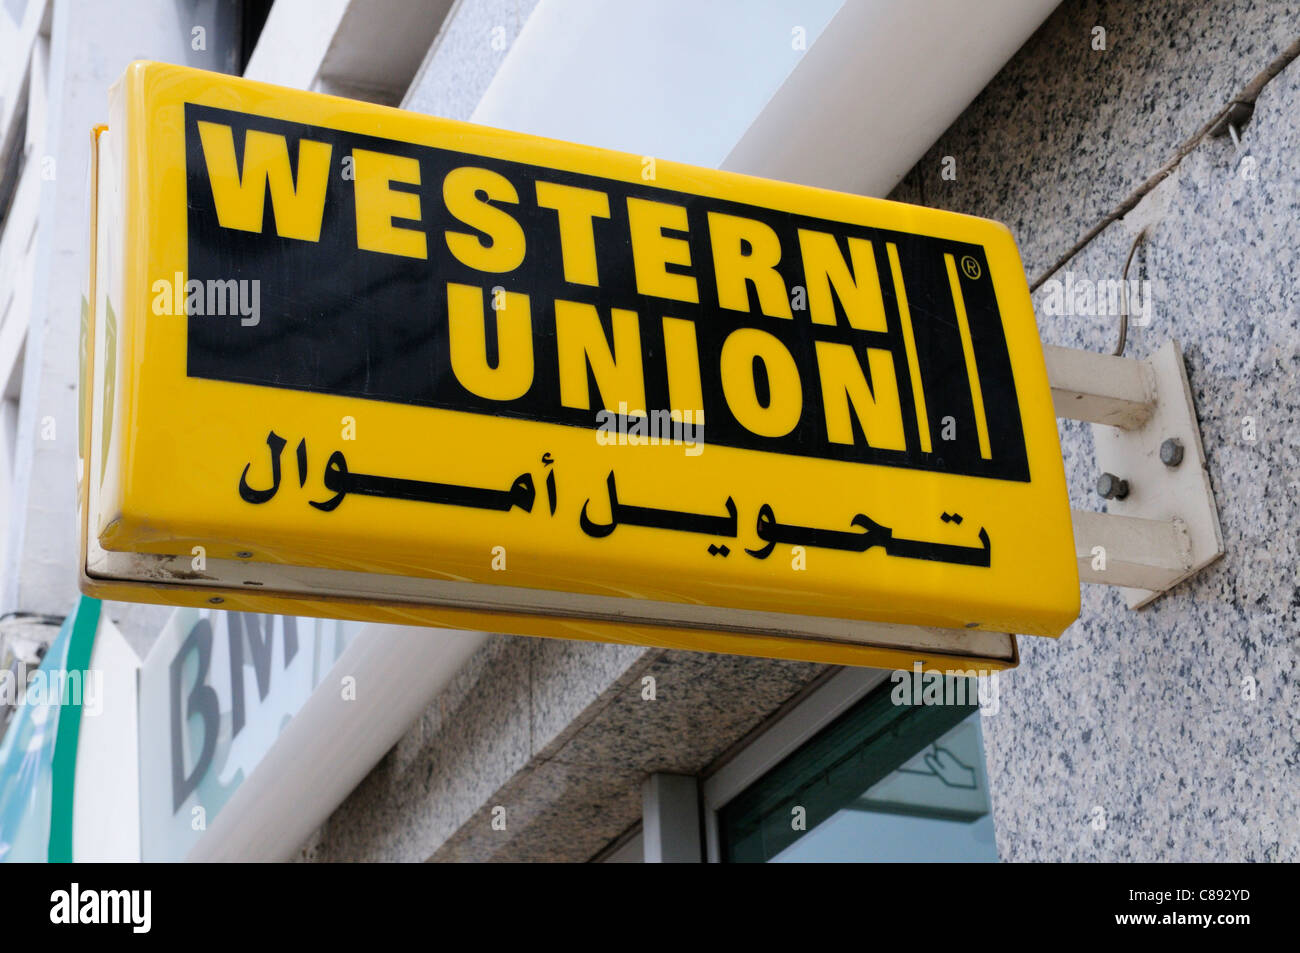 Western union stock photos western union stock images alamy